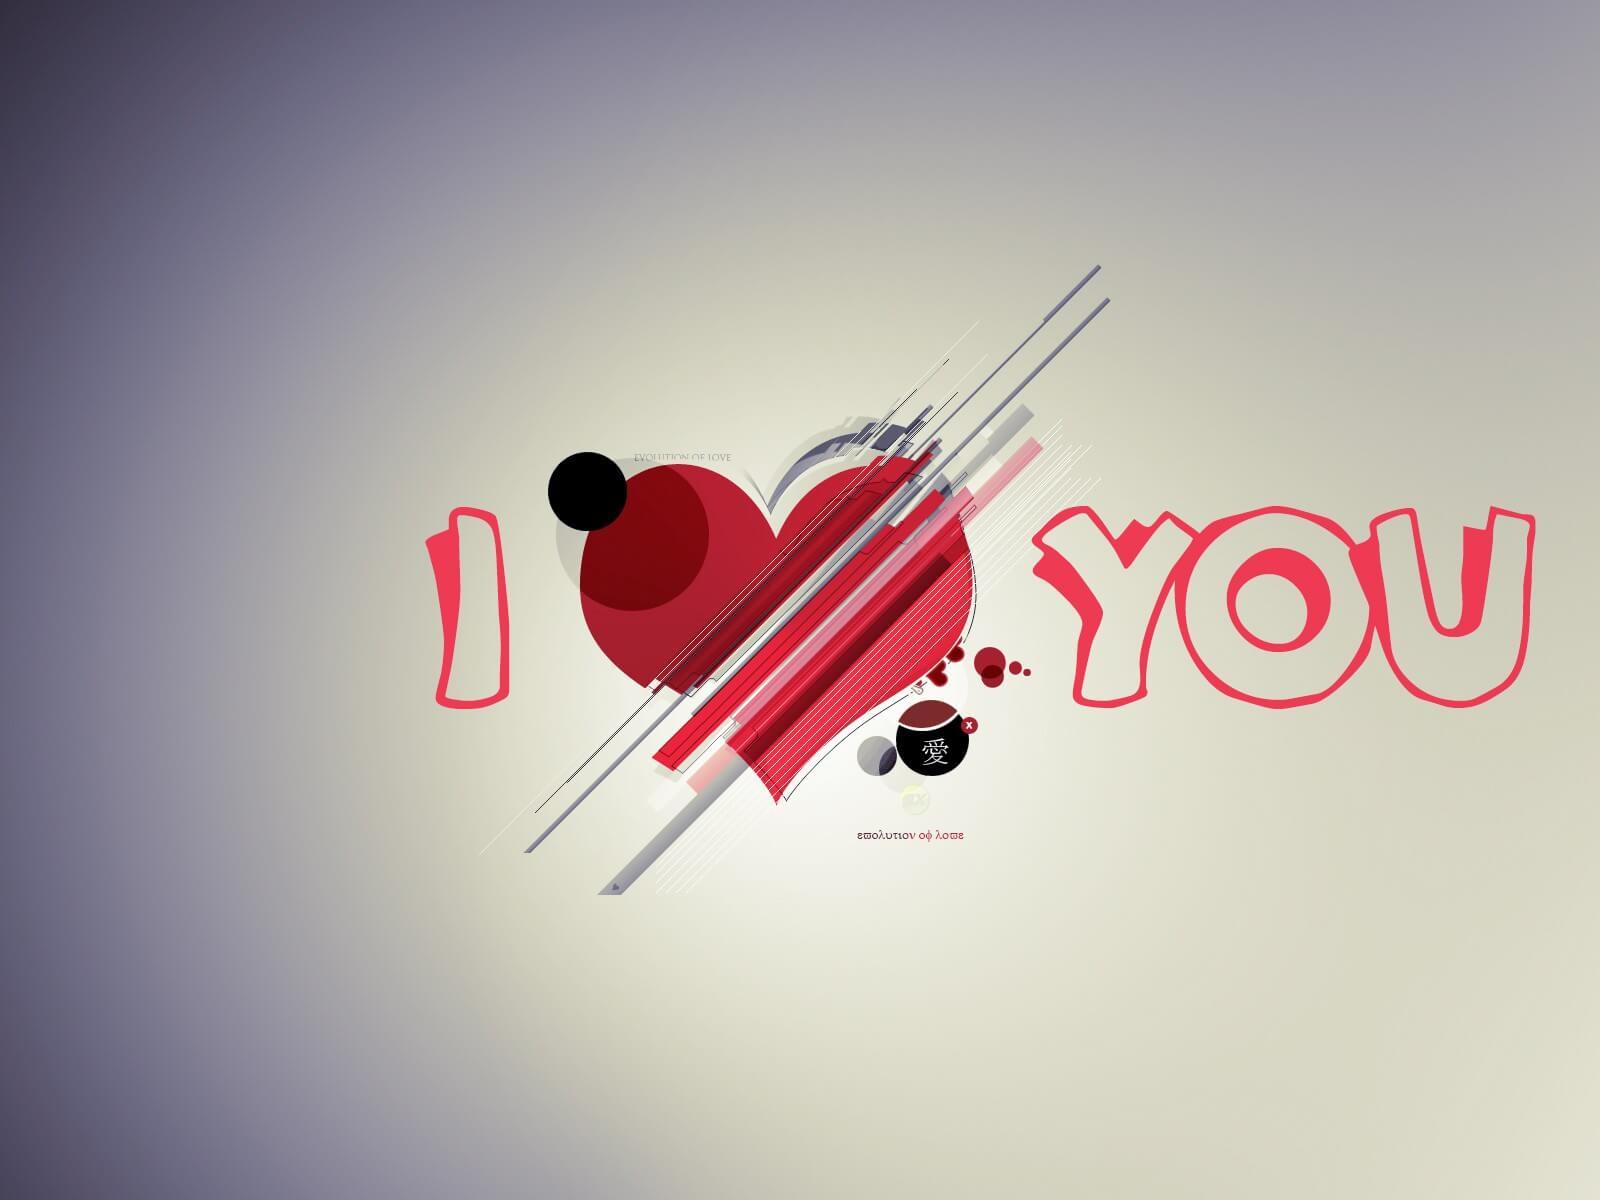 i love you pics 43 (1)